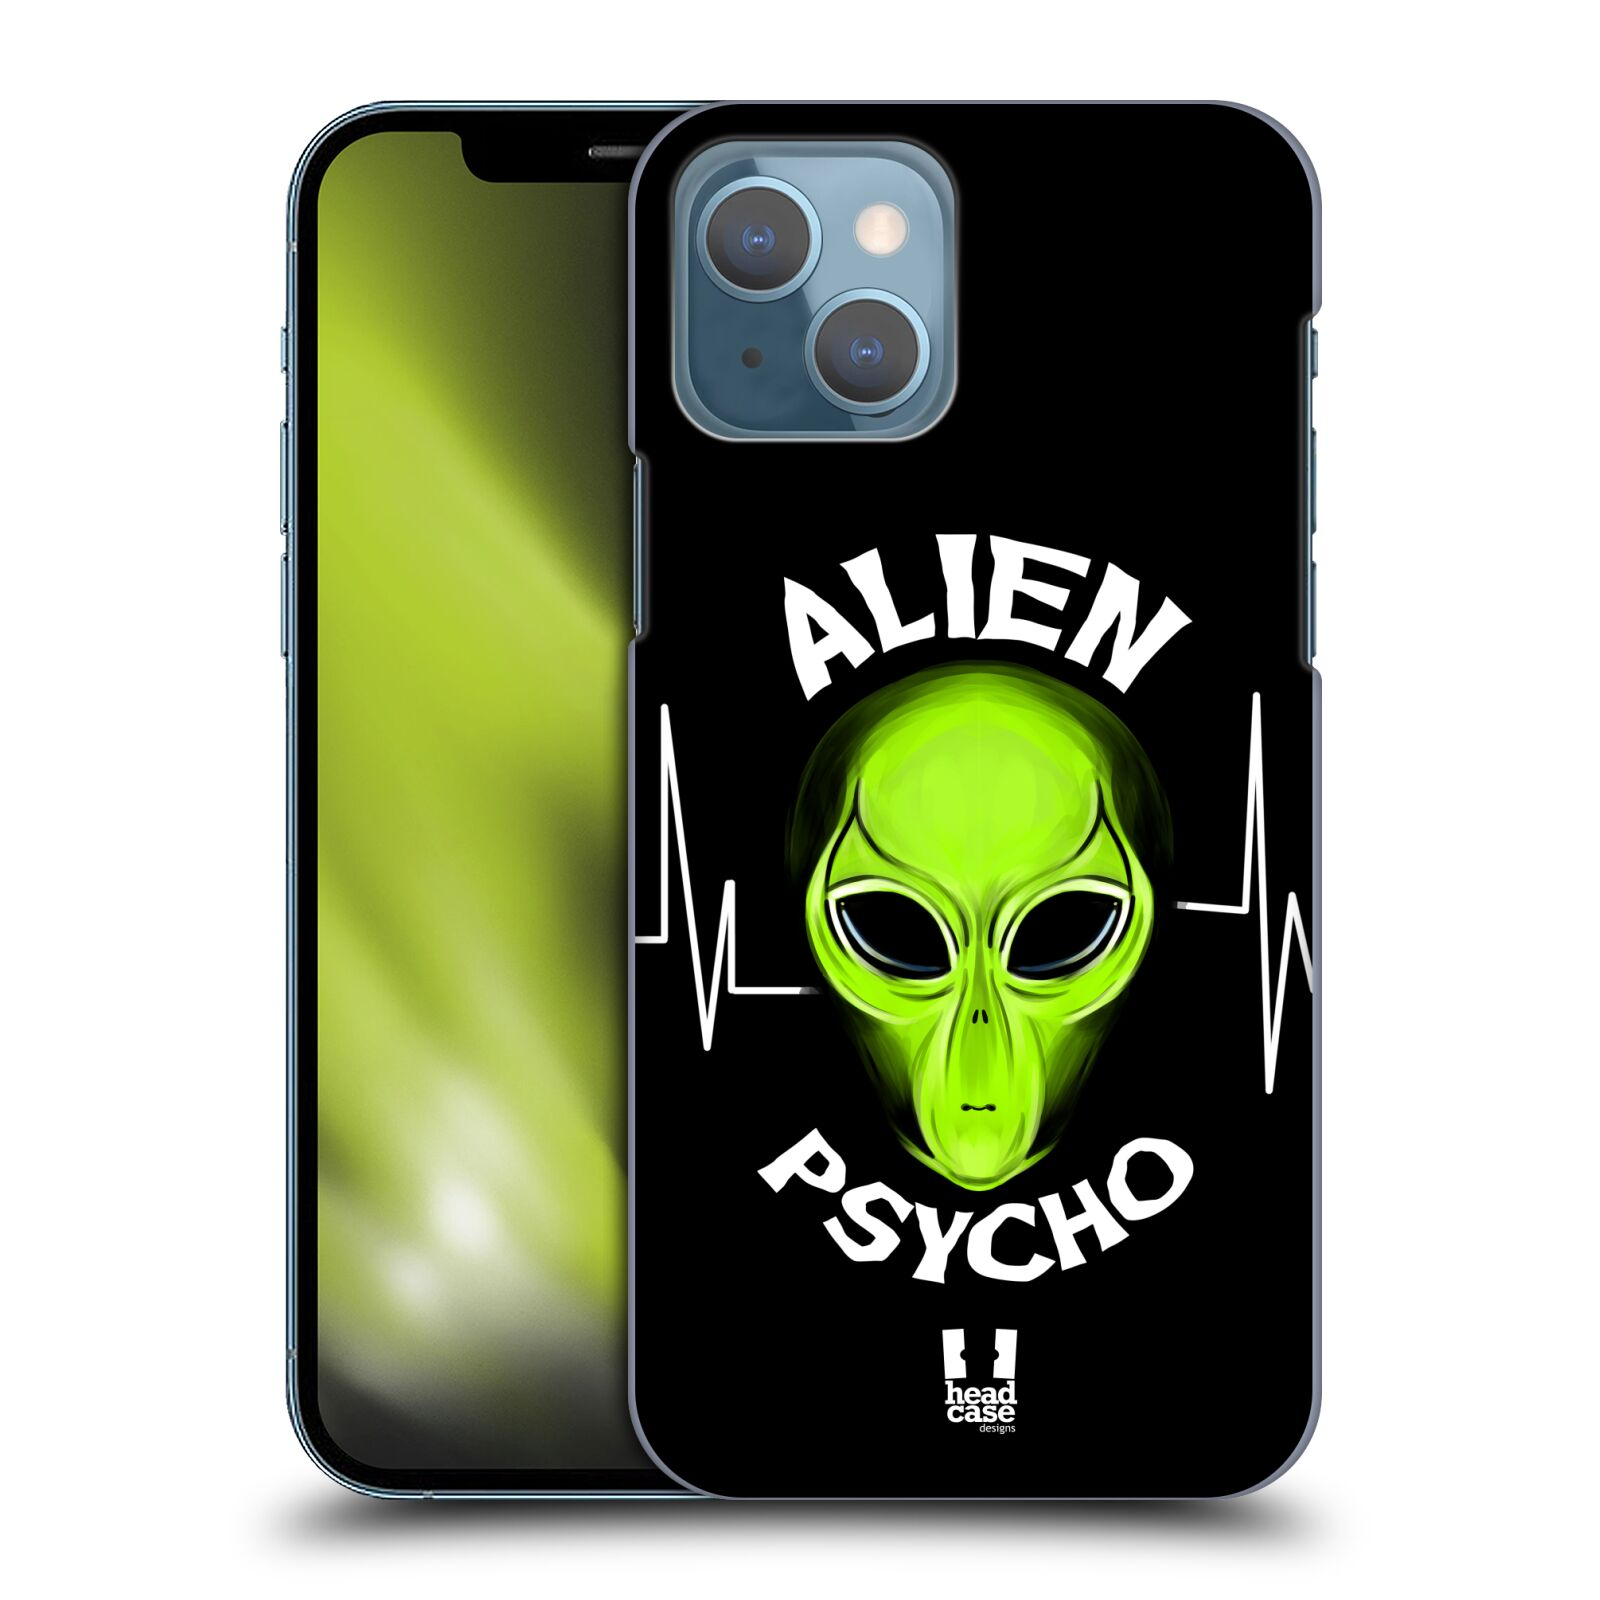 Plastové pouzdro na mobil Apple iPhone 13 - Head Case - ALIENS PSYCHO